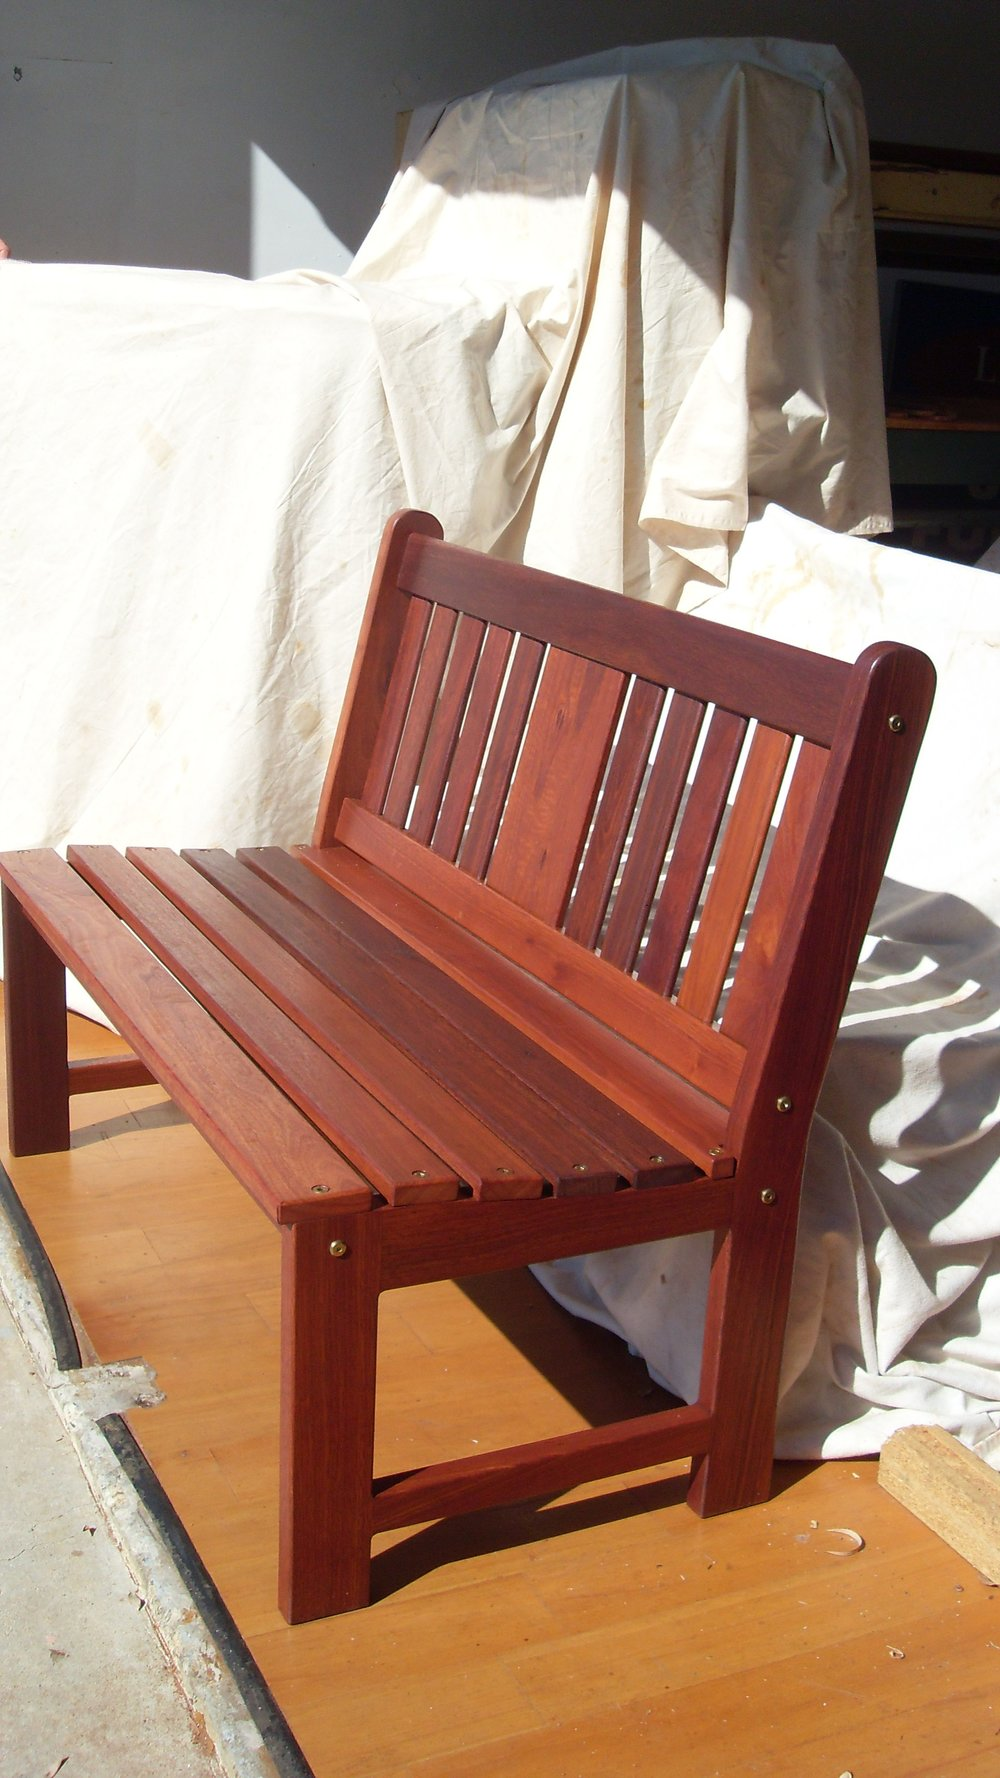 c11 clive bench - no arms.JPG